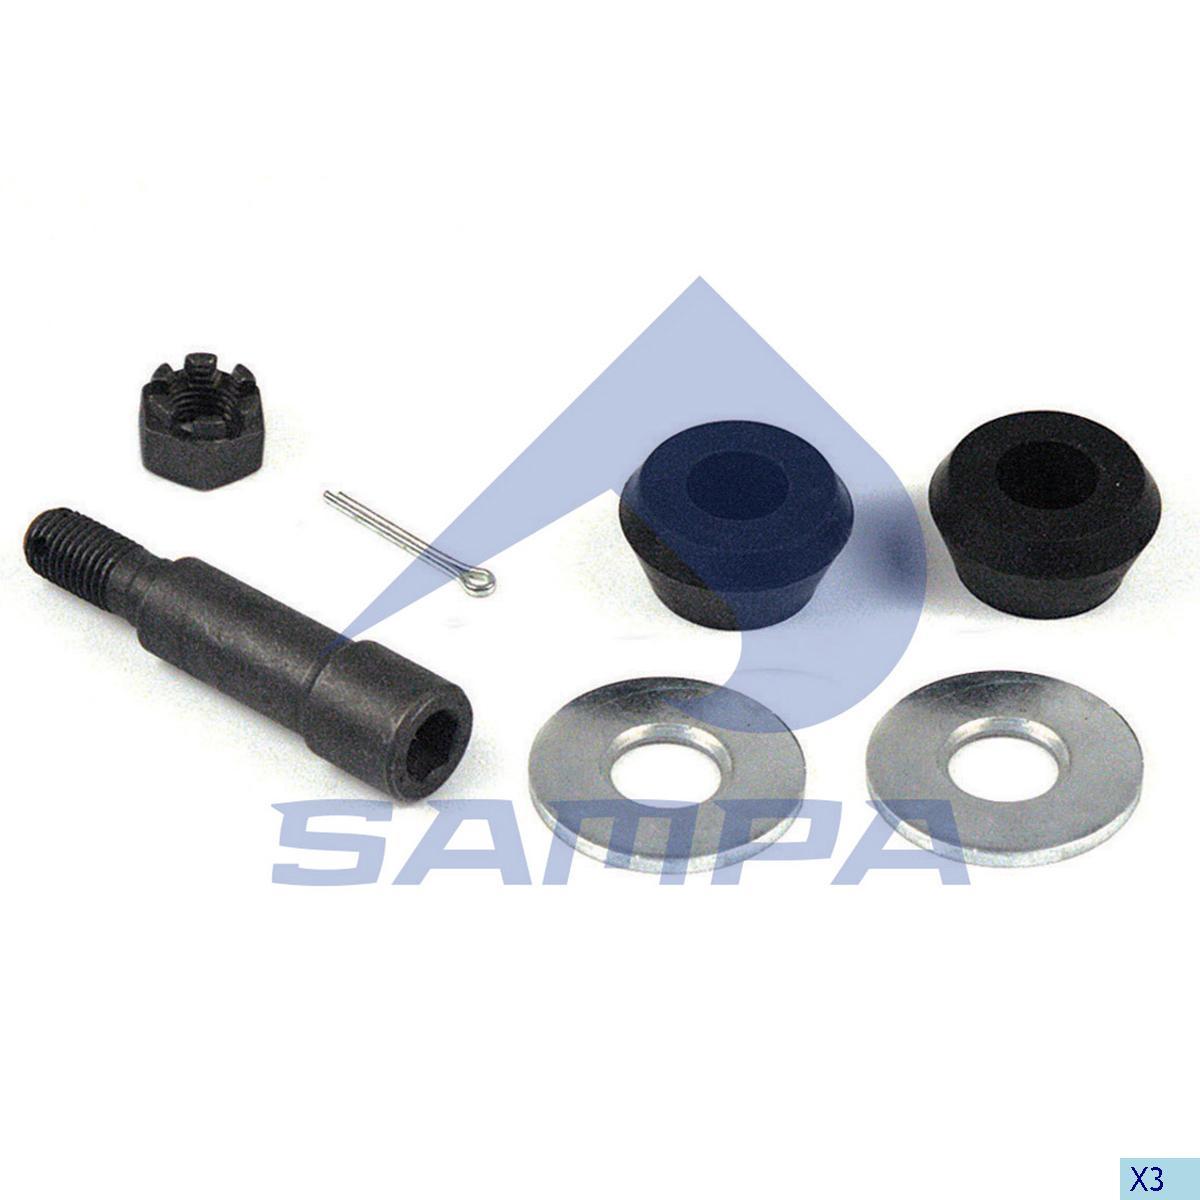 Repair Kit, Shock Absorber, Scania, Suspension